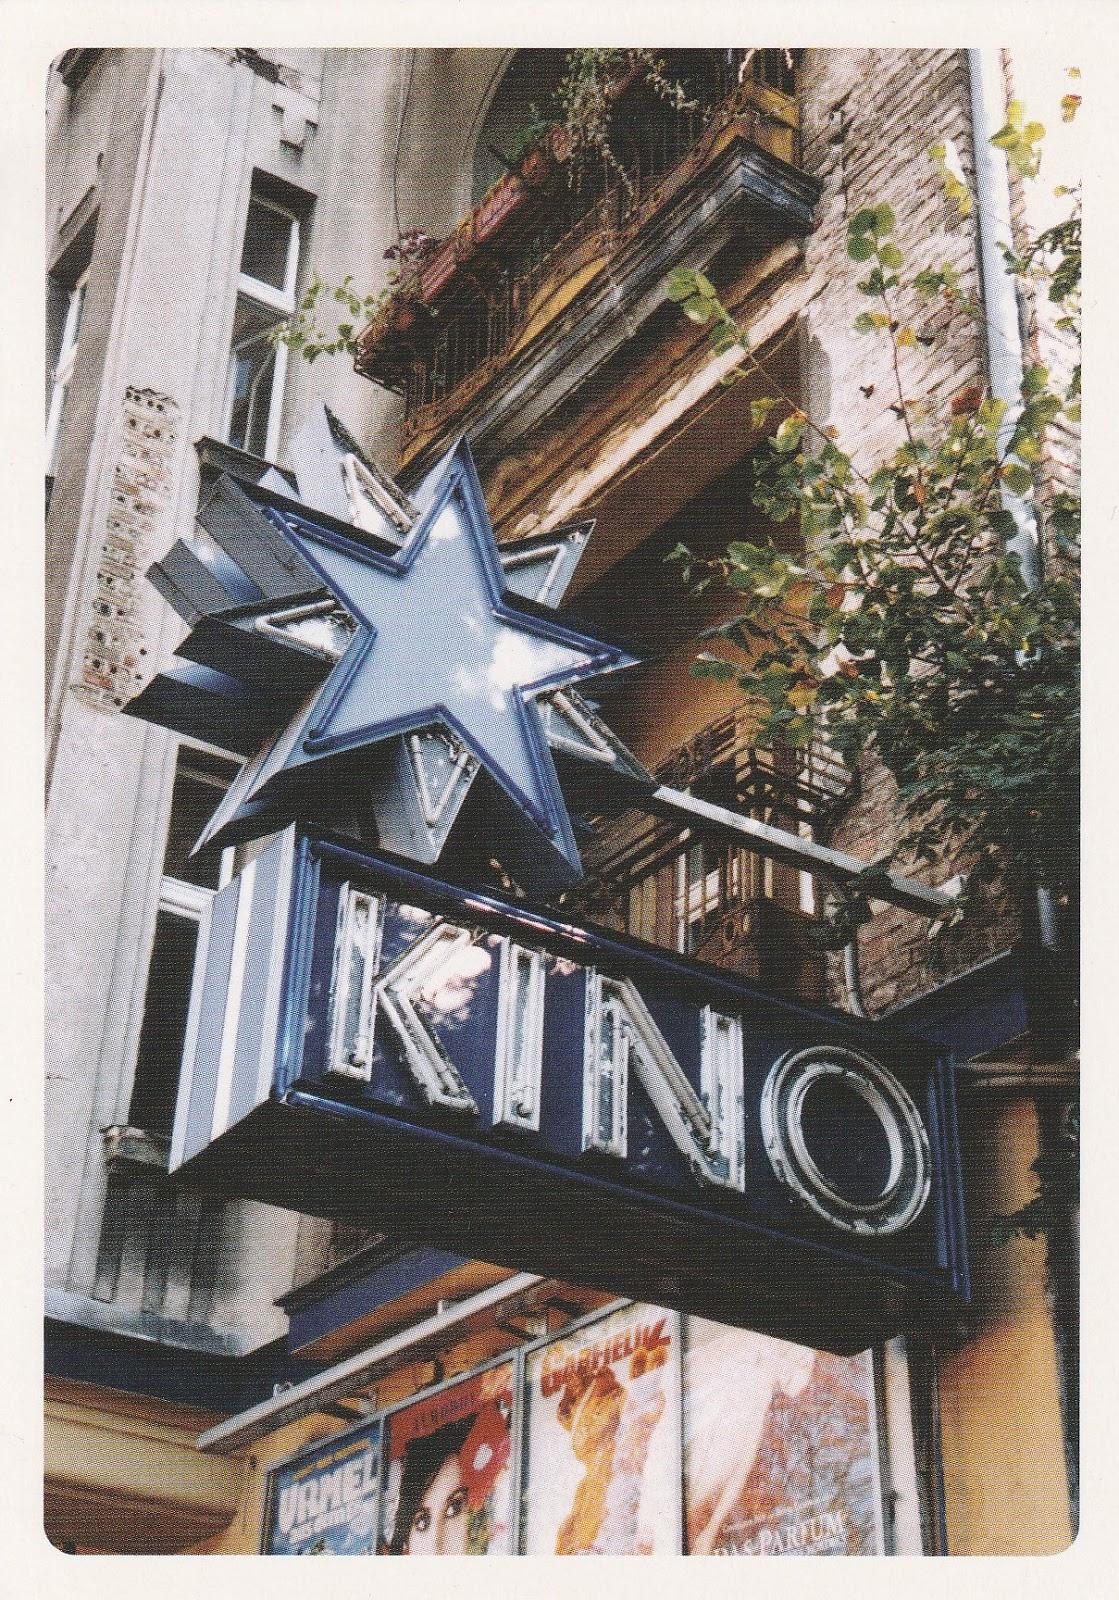 Kino Blauer Stern